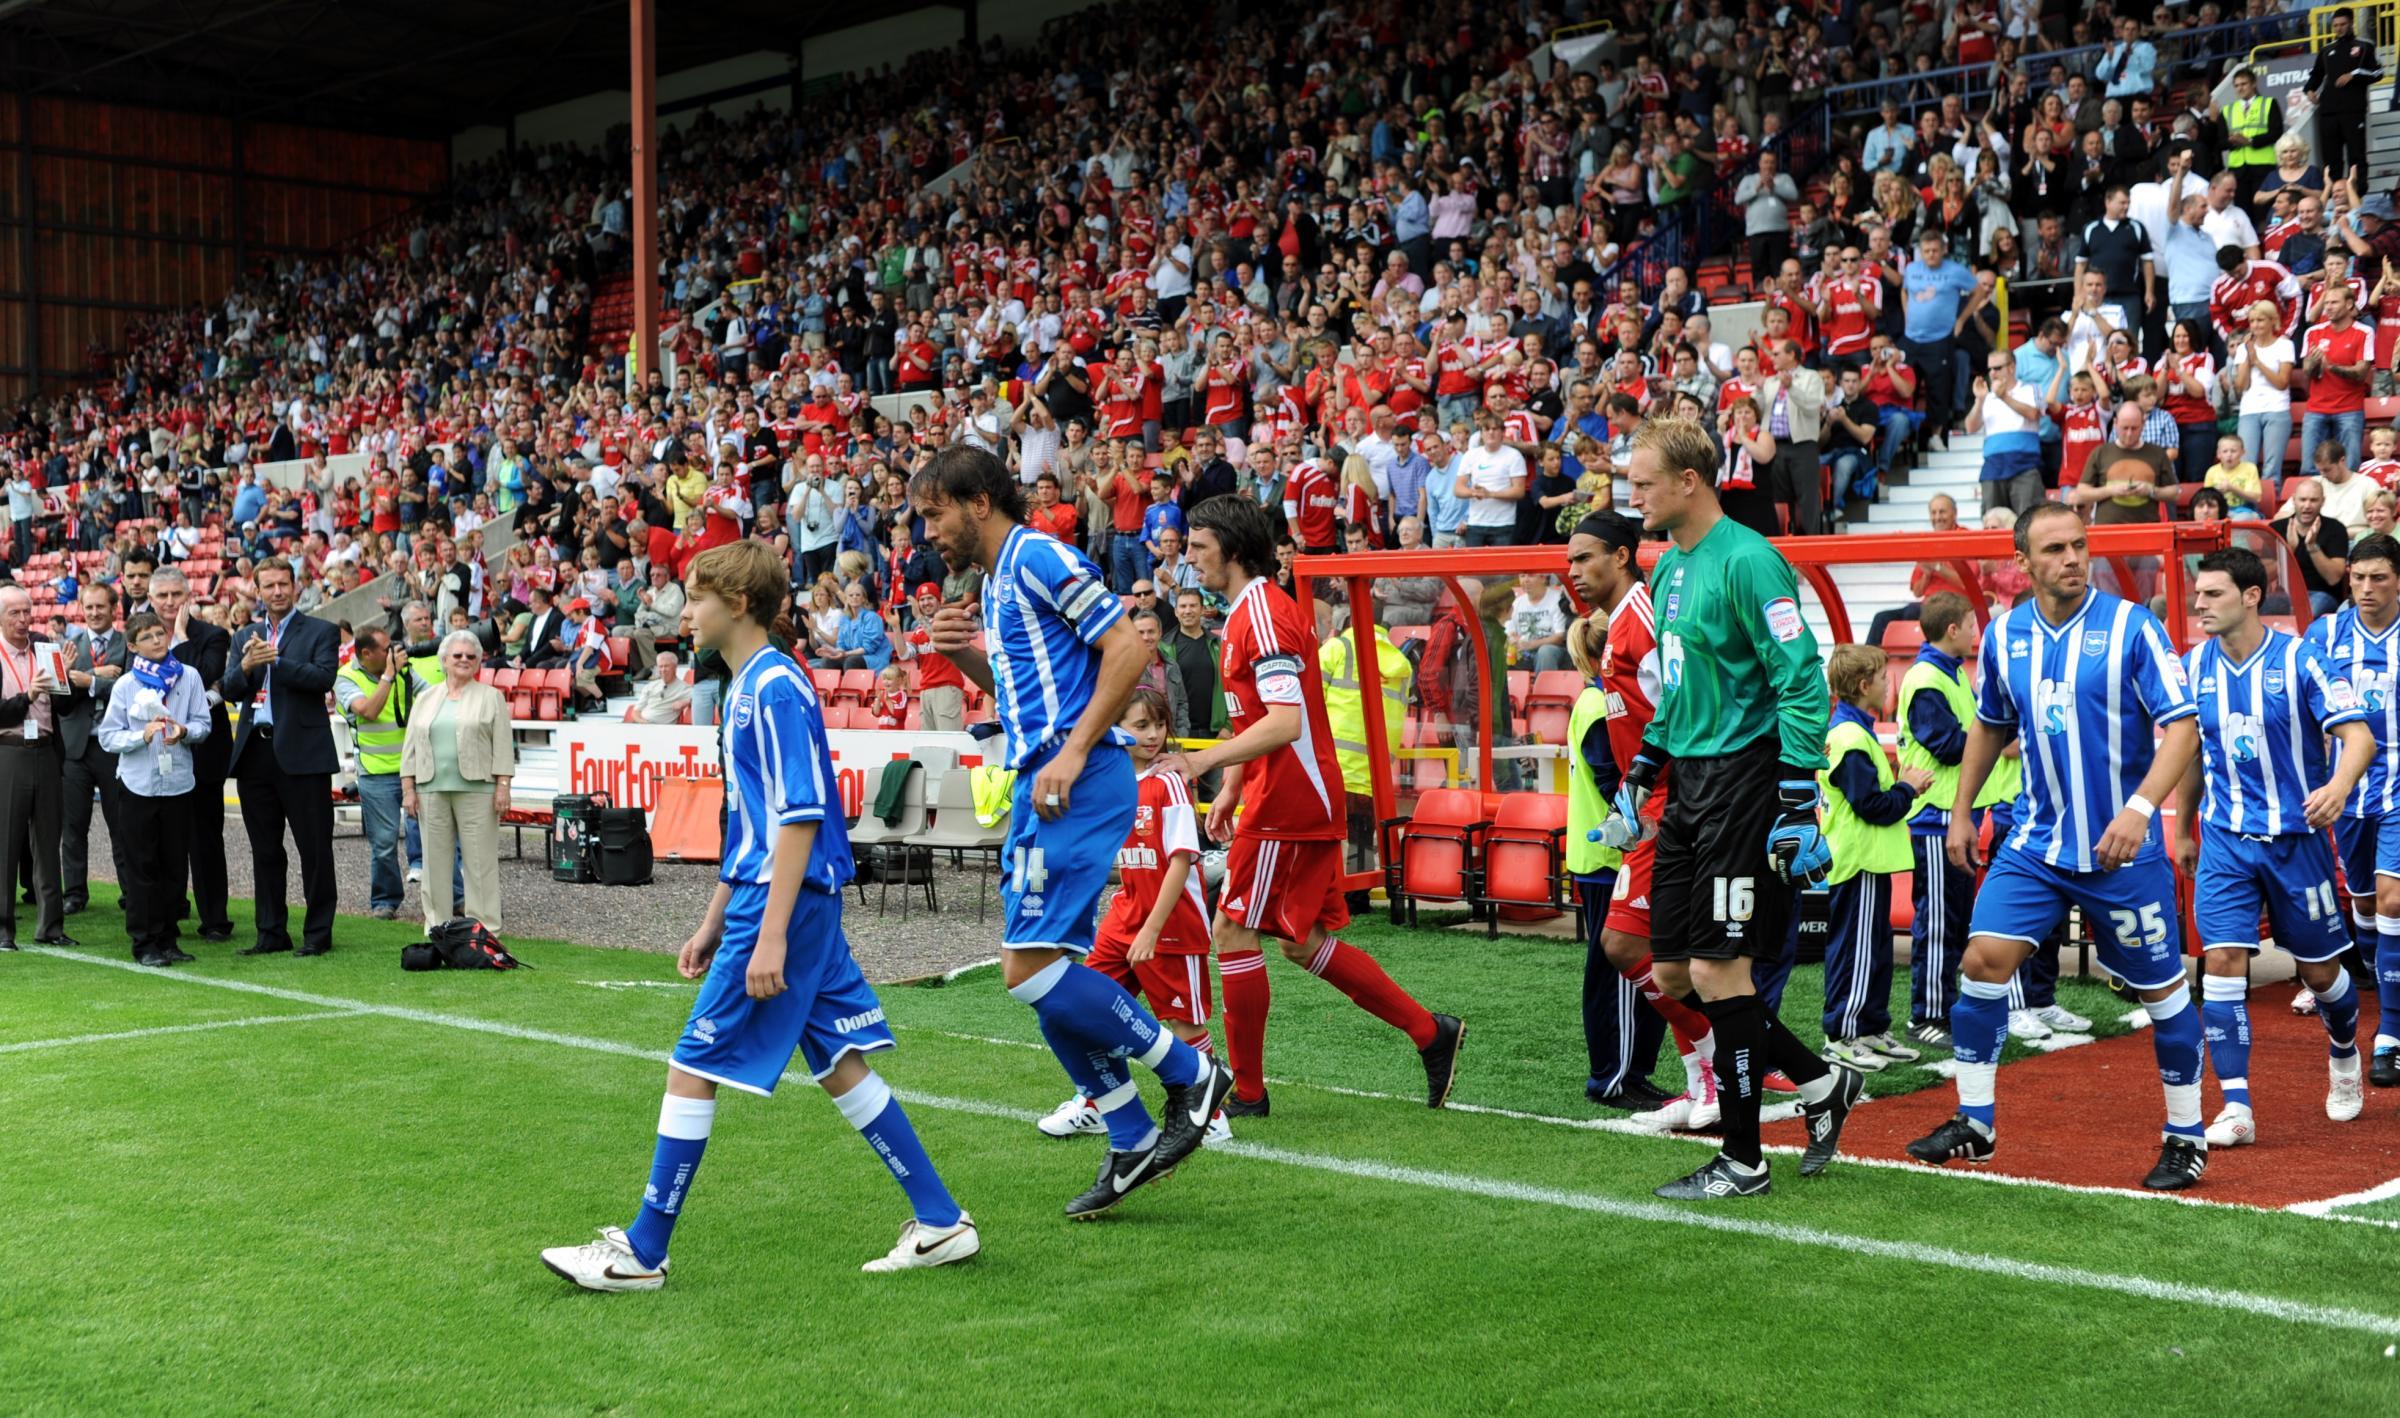 Flashback: Sparrow's memorable Albion debut against Swindon